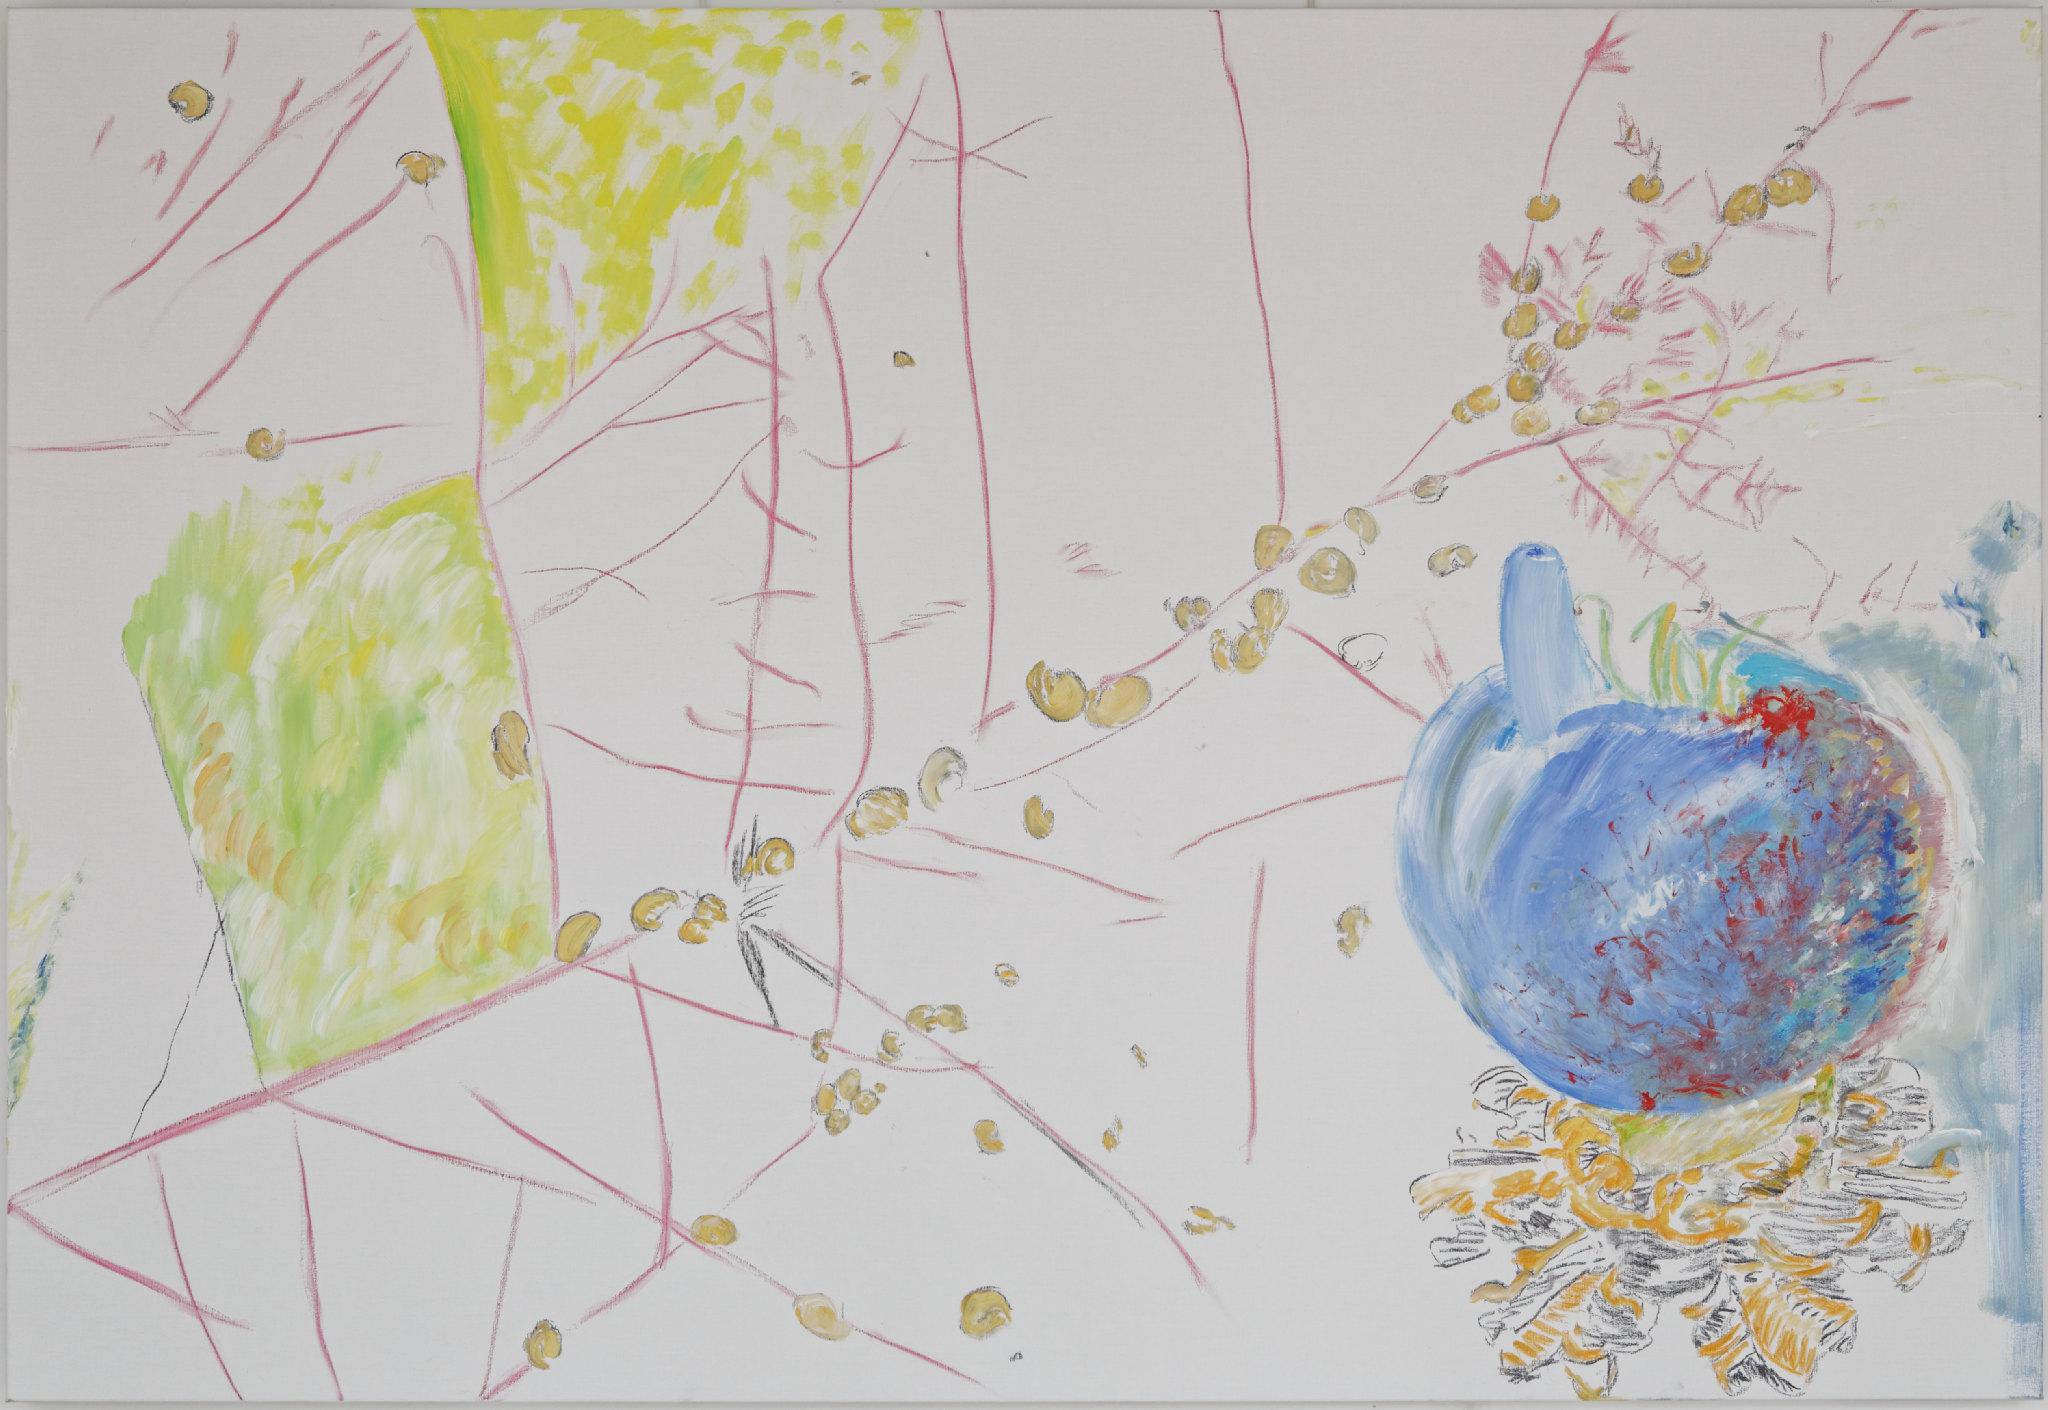 Bleu T (acrylic and mixed media, 130 x 190 cm - 2013)